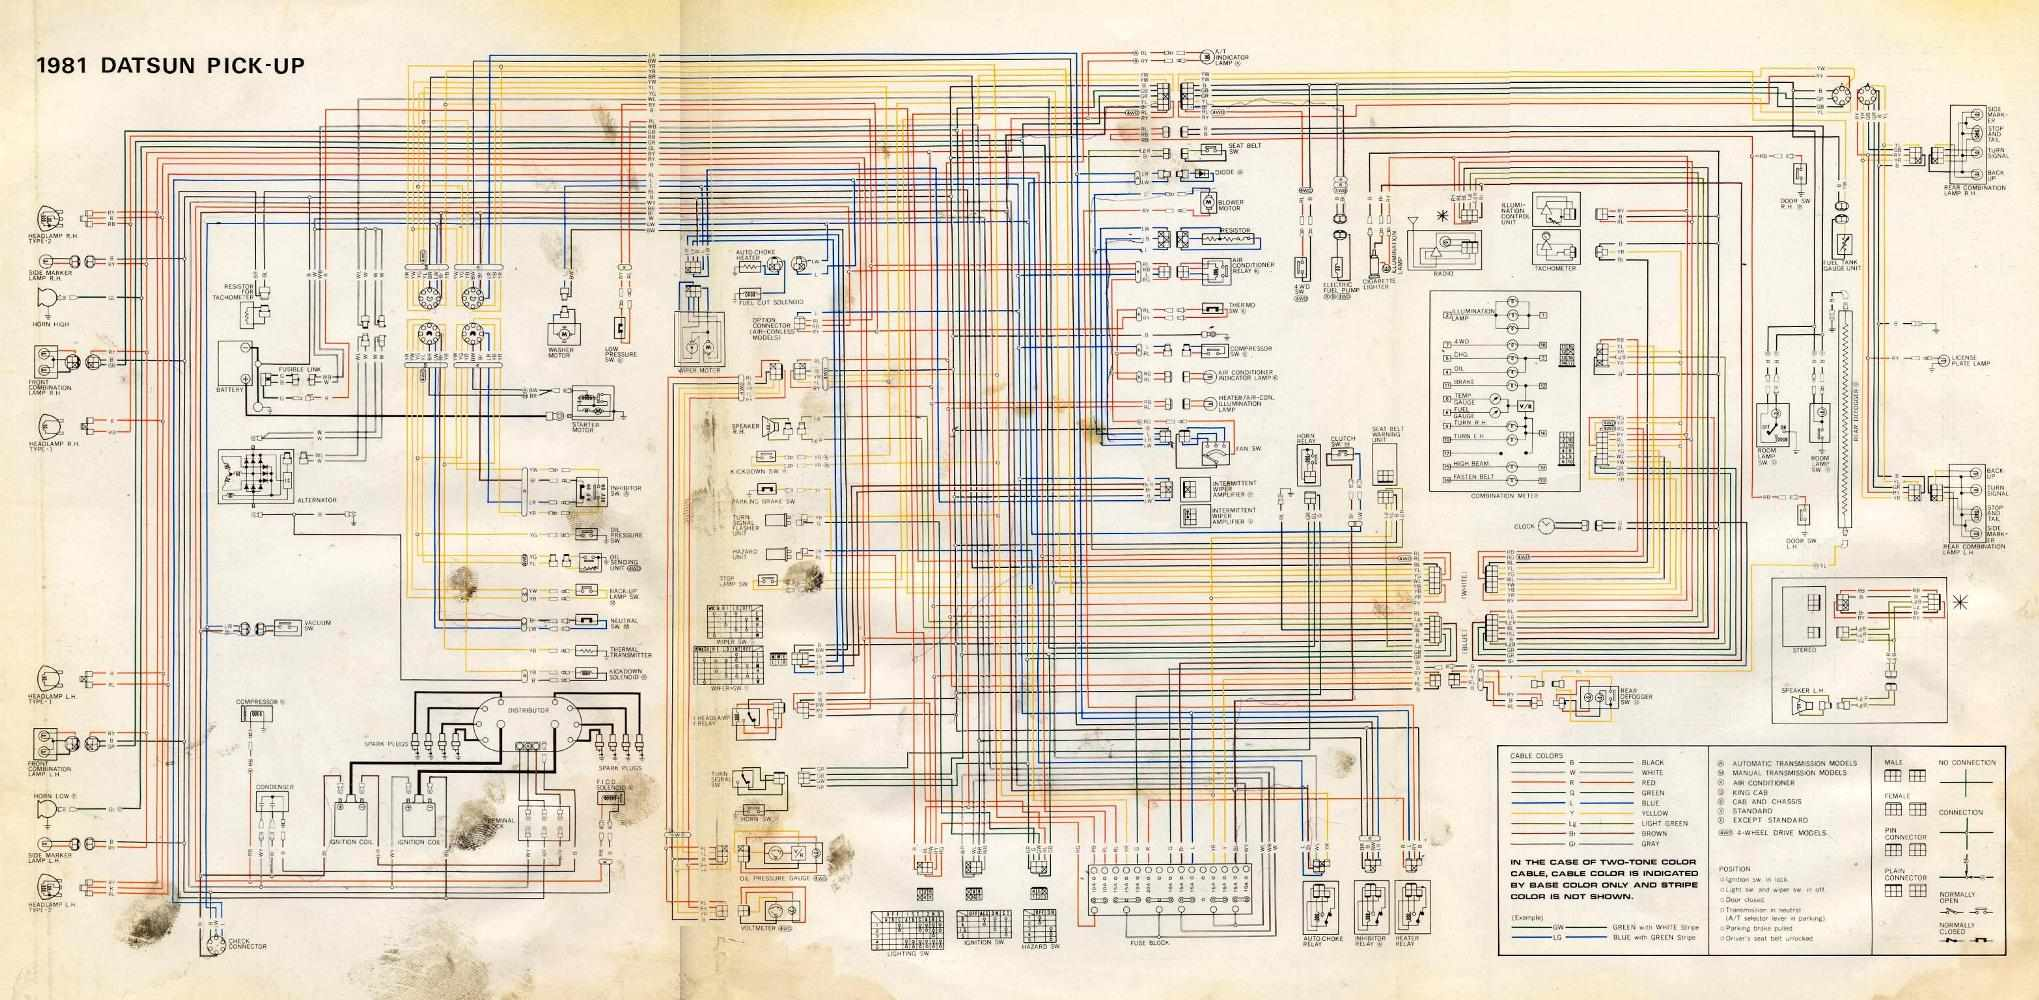 Nissan D21 Alternator Wiring Diagram